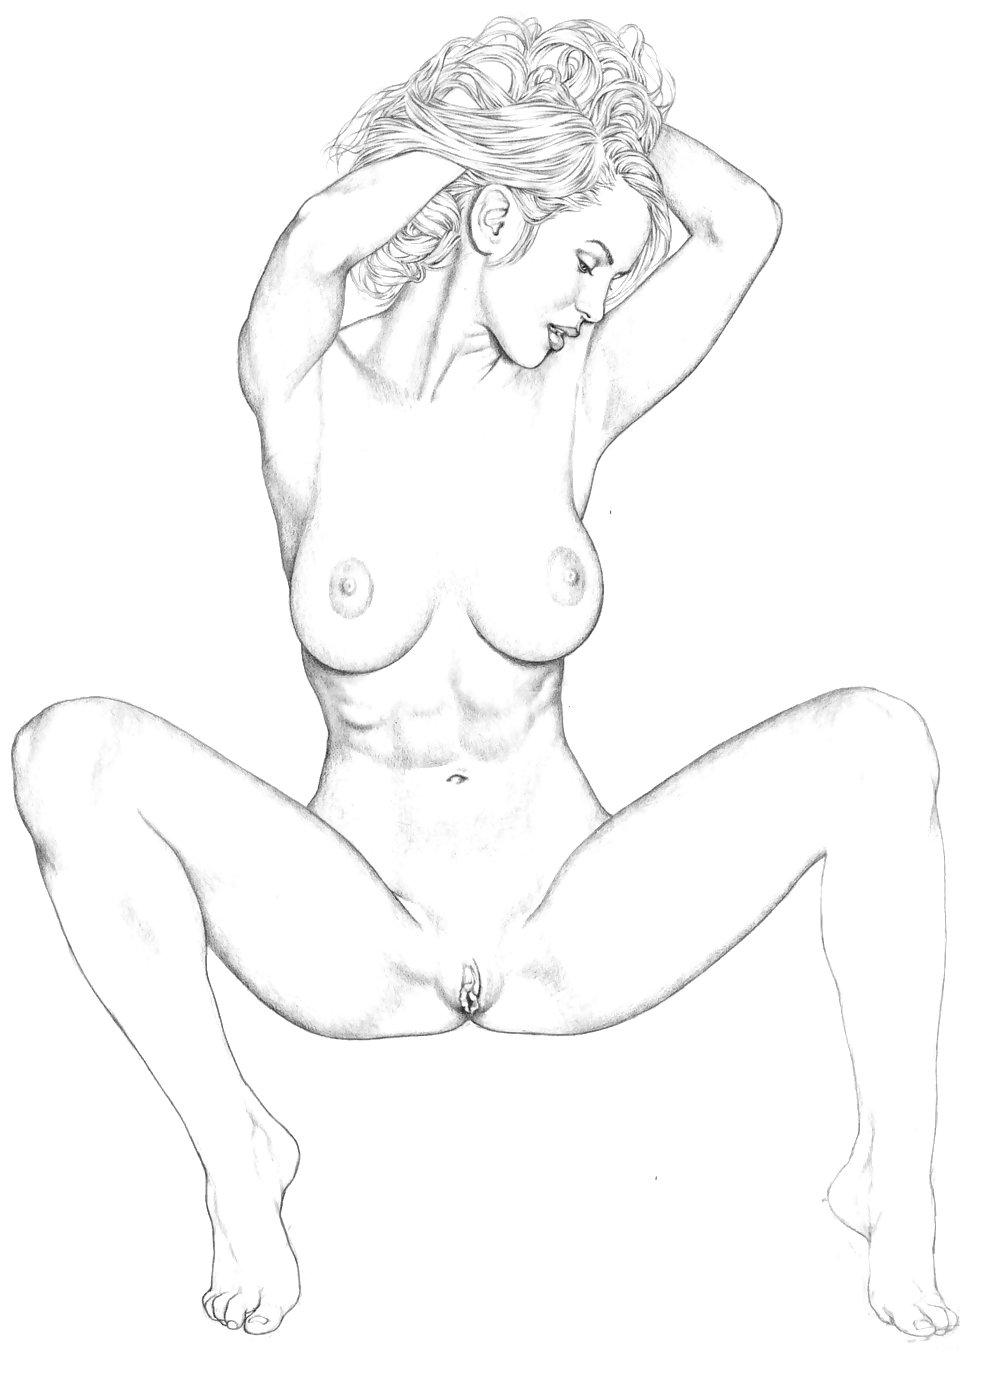 Naked sketches of henti girls, sapphic erotica hairy